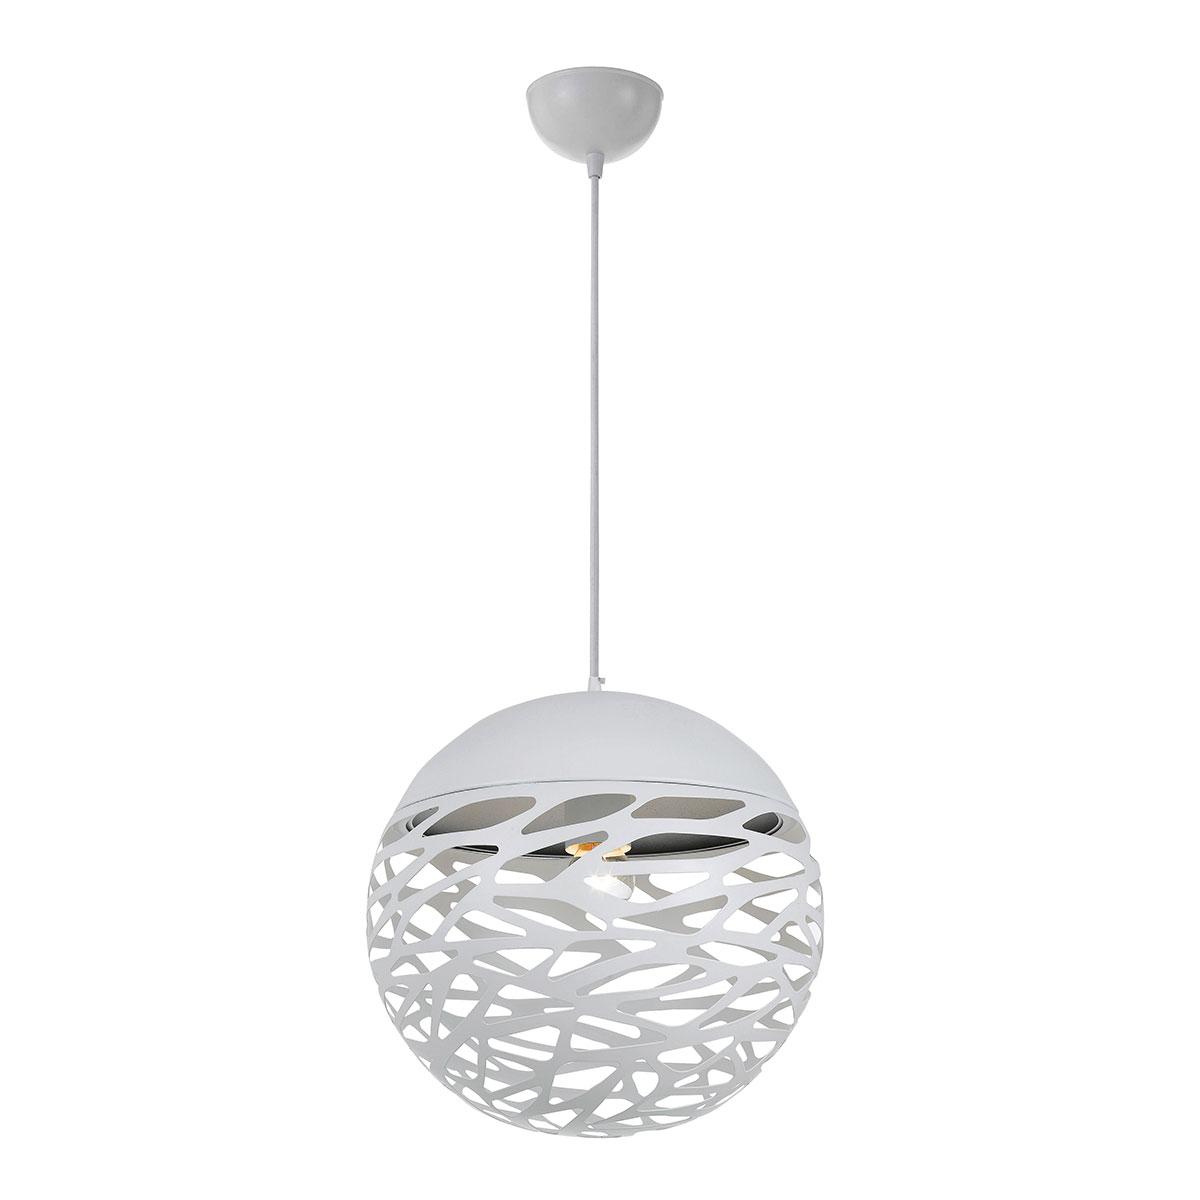 Farina large white ball pendant online lighting farina large white ball pendant mozeypictures Gallery